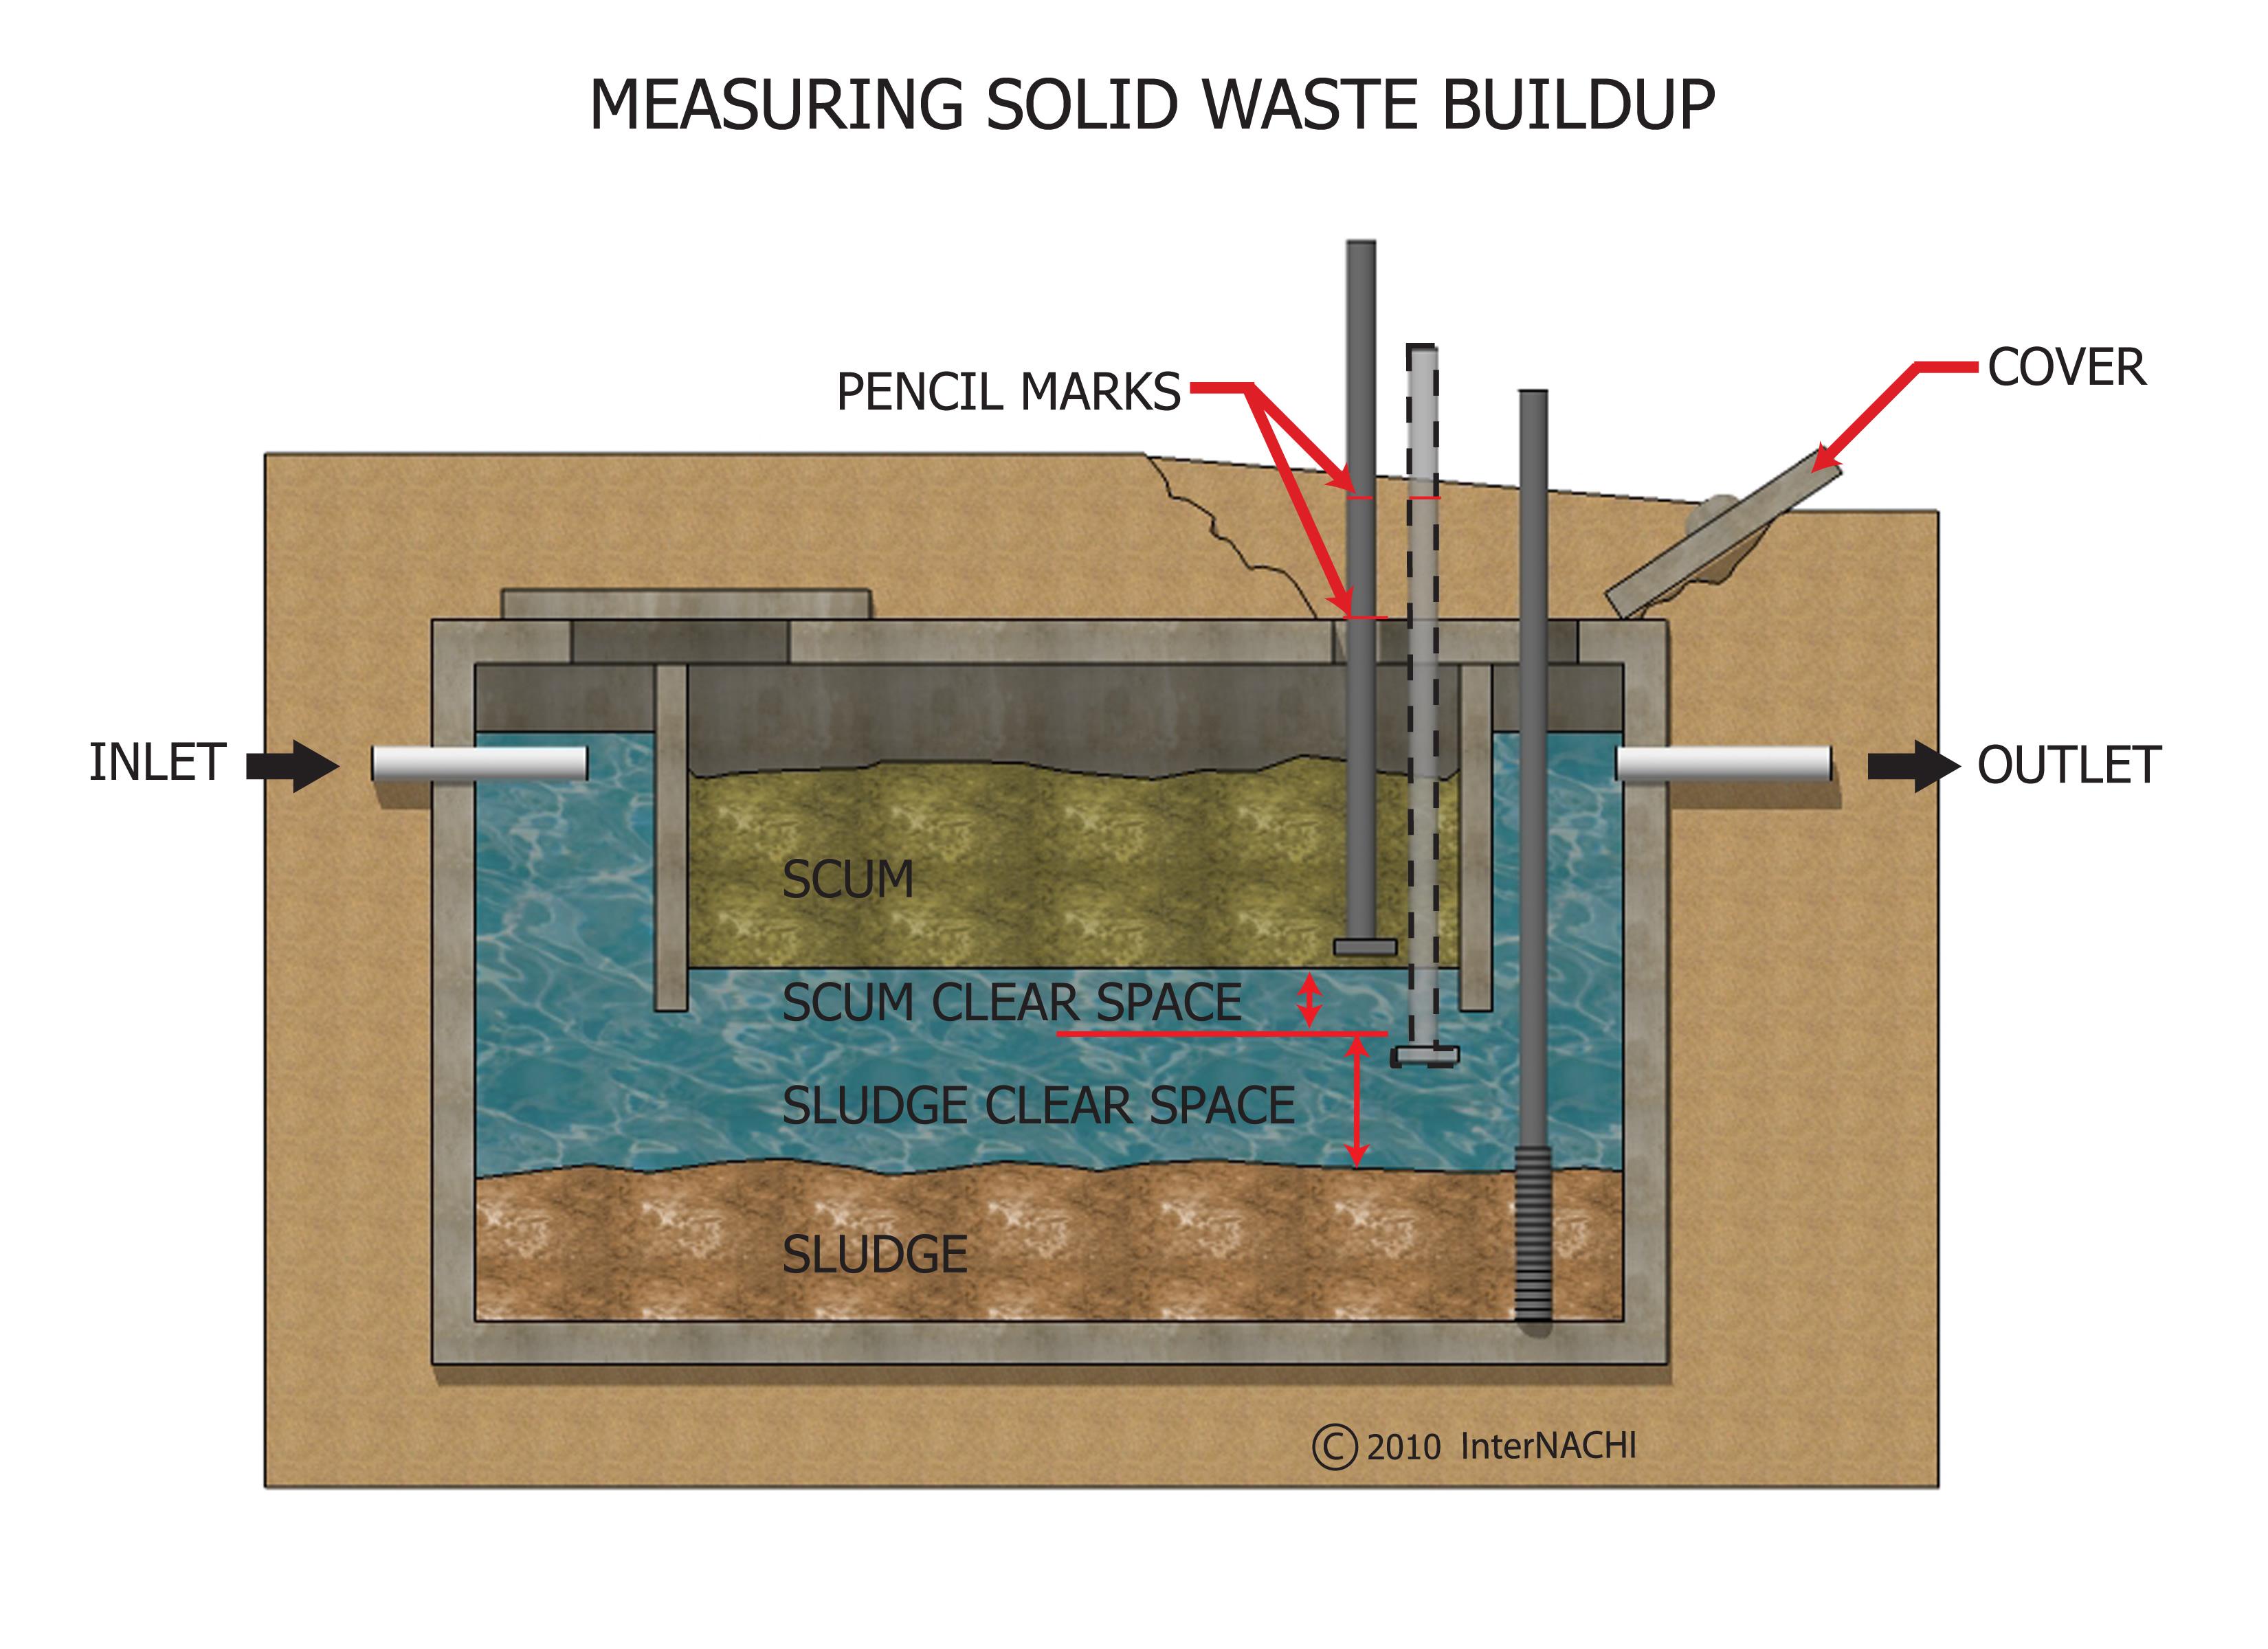 Measuring solid waste buildup.